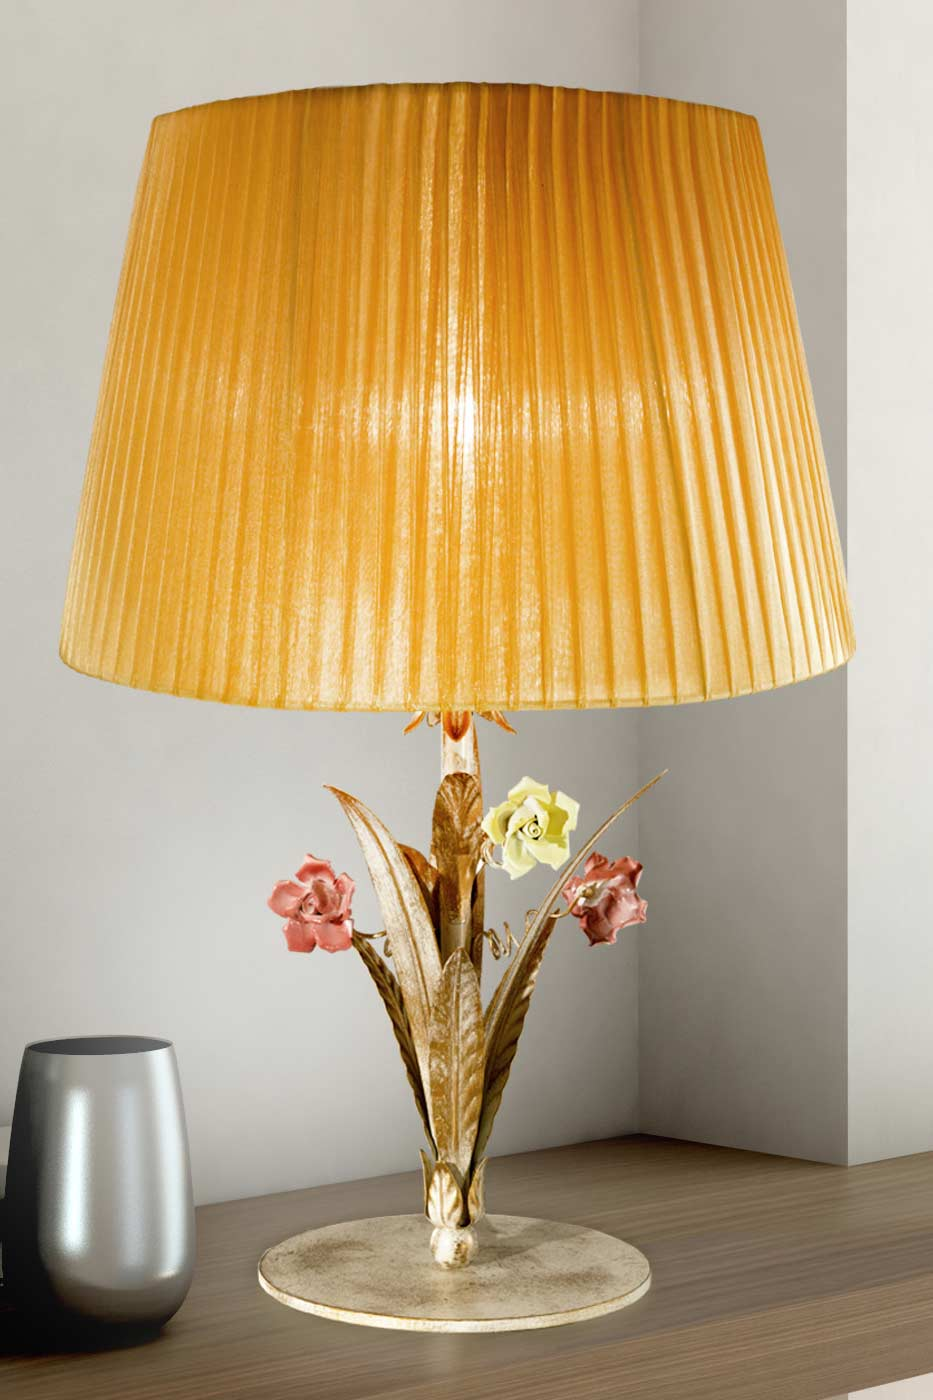 Grande lampe cuir or et cuivre abat jour jaune dor - Abat jour dore ...